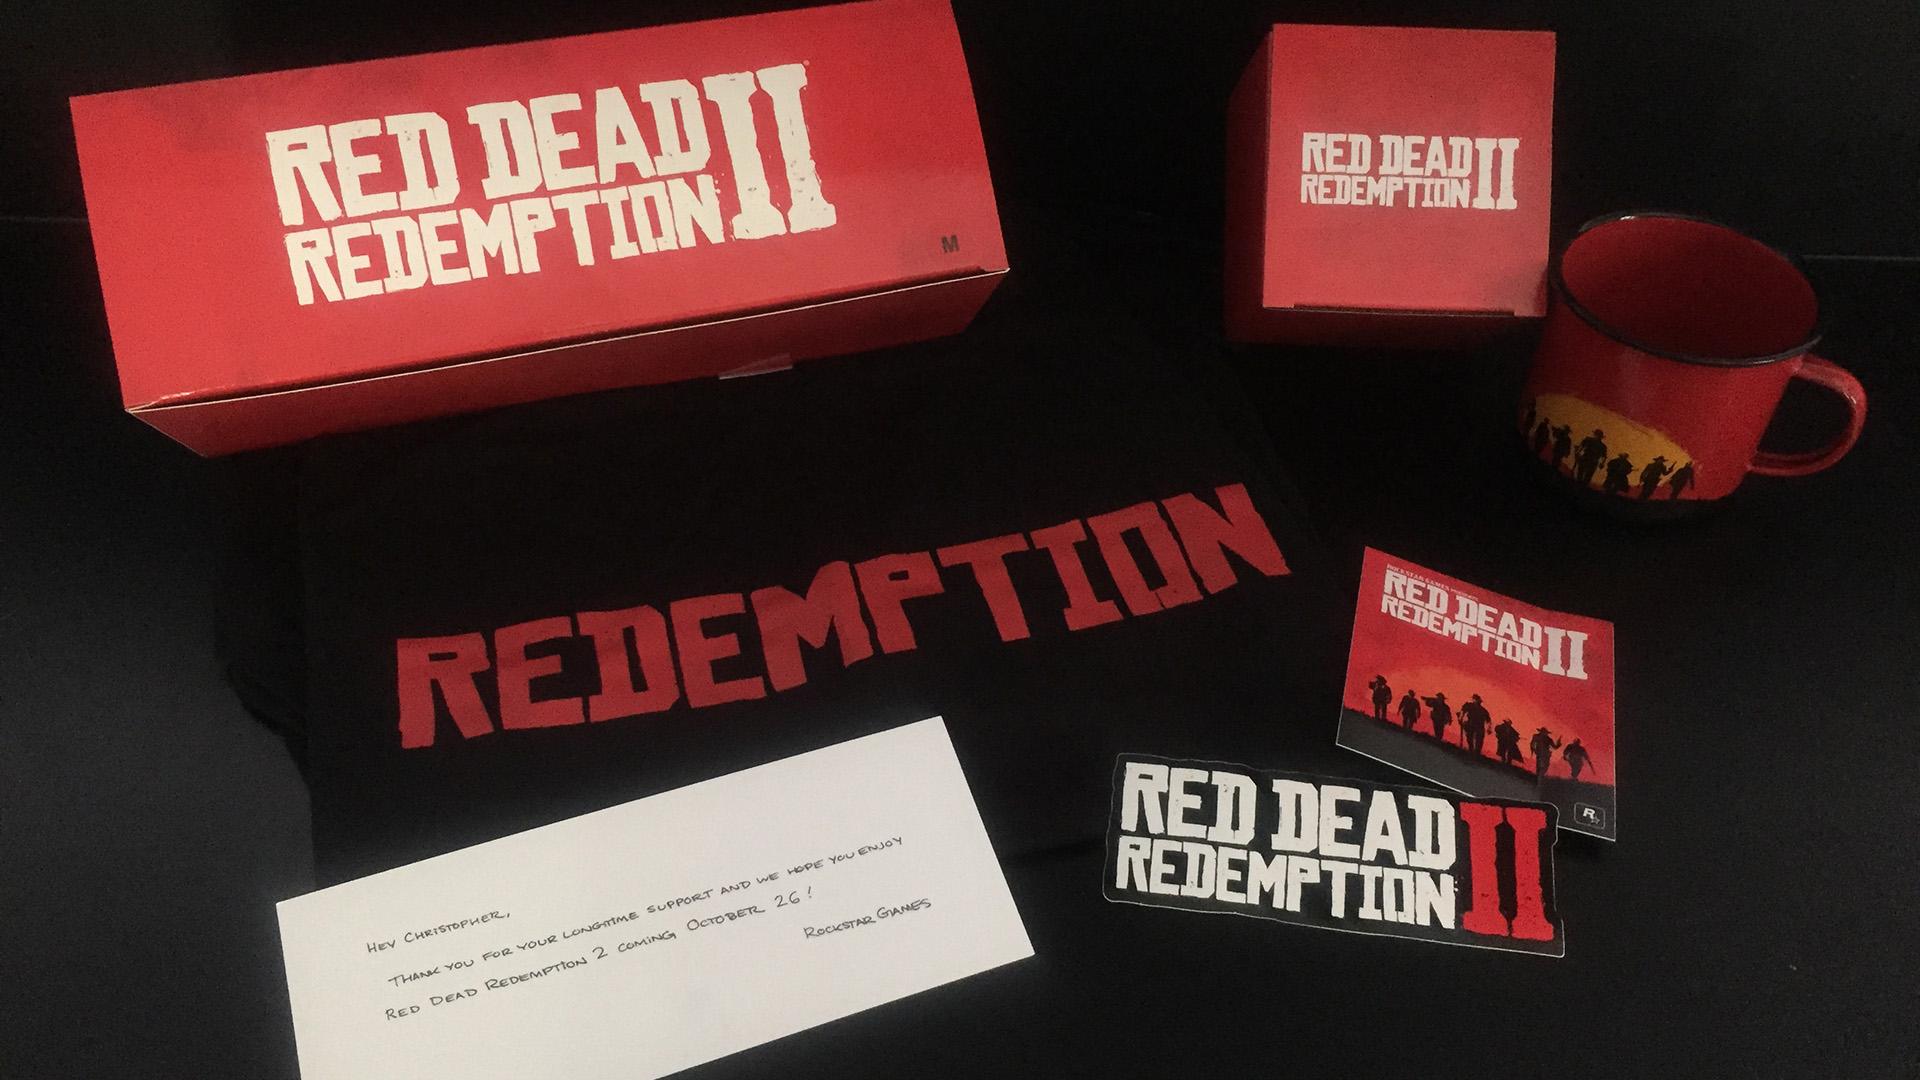 Unboxing Red Dead Redemption II Colis Rockstar Games